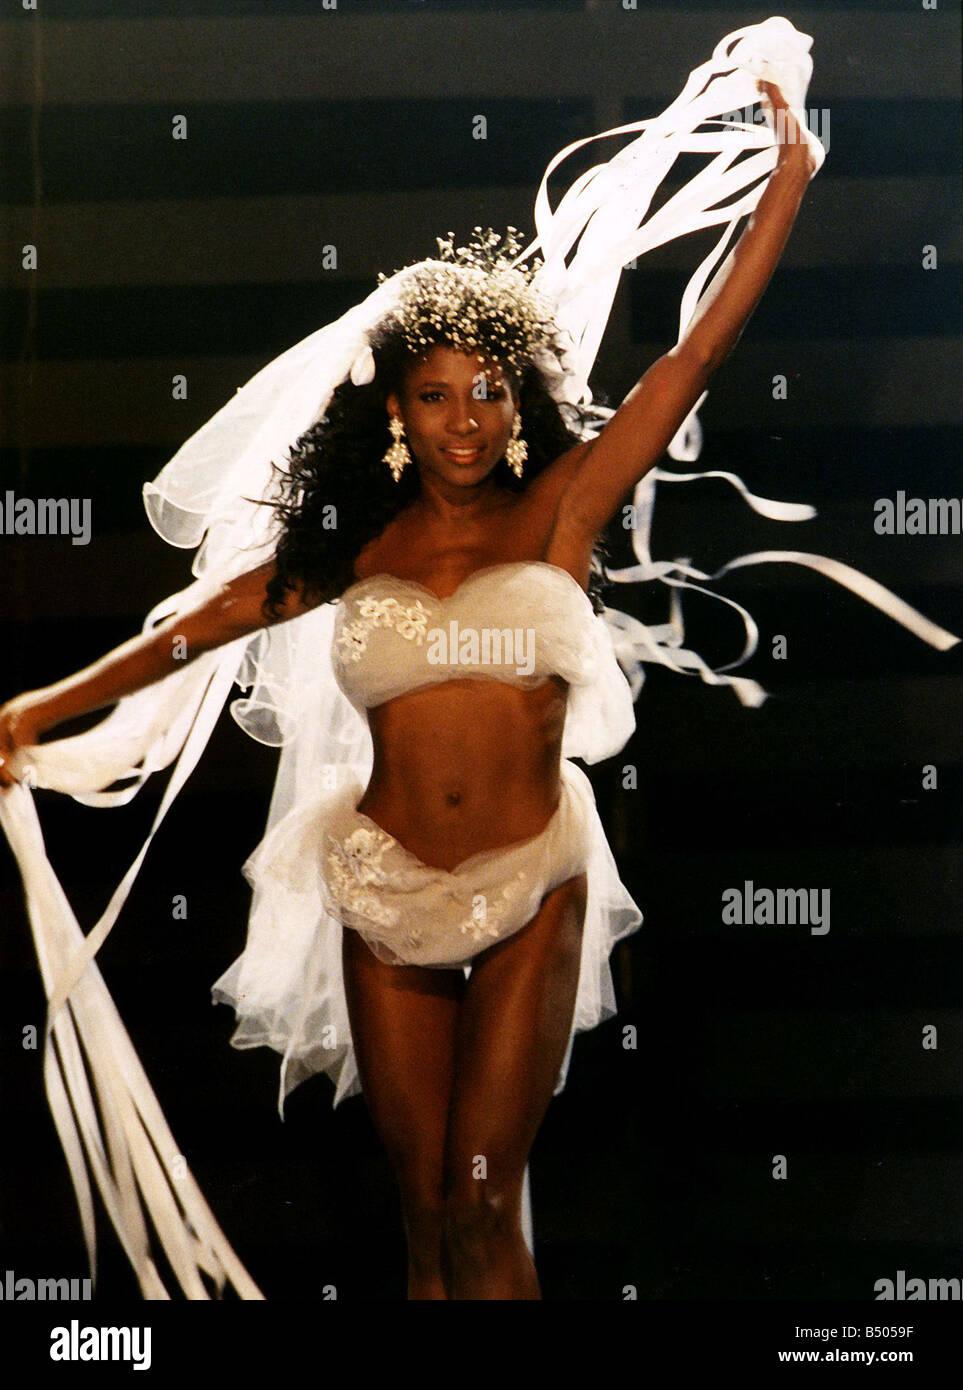 Sinitta British Pop Singer - Stock Image